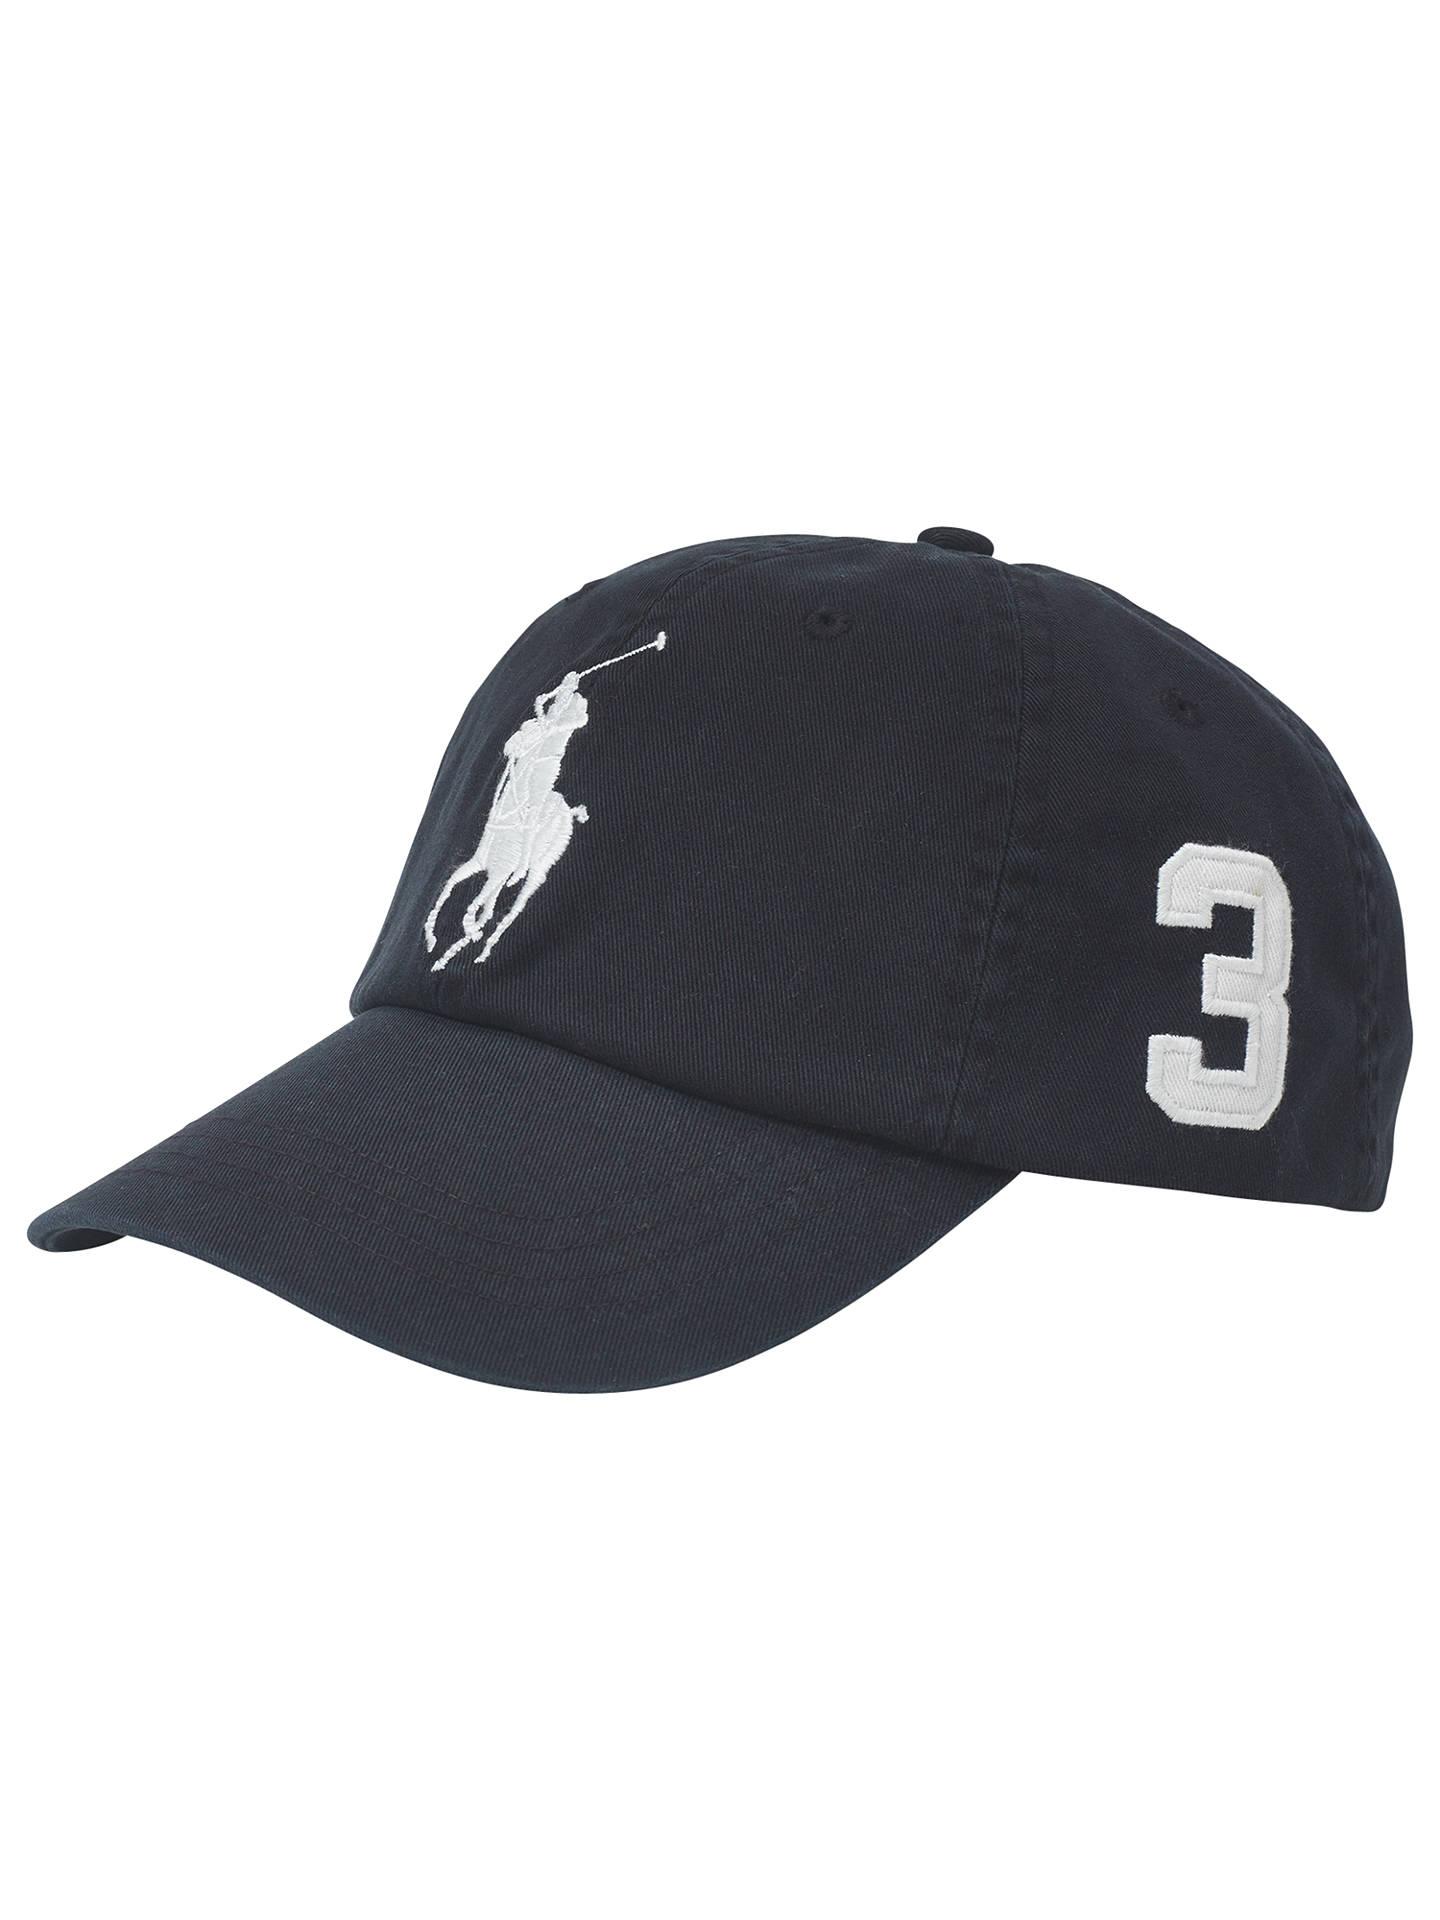 44bb25a4659 BuyPolo Ralph Lauren Big Pony Chino Baseball Cap